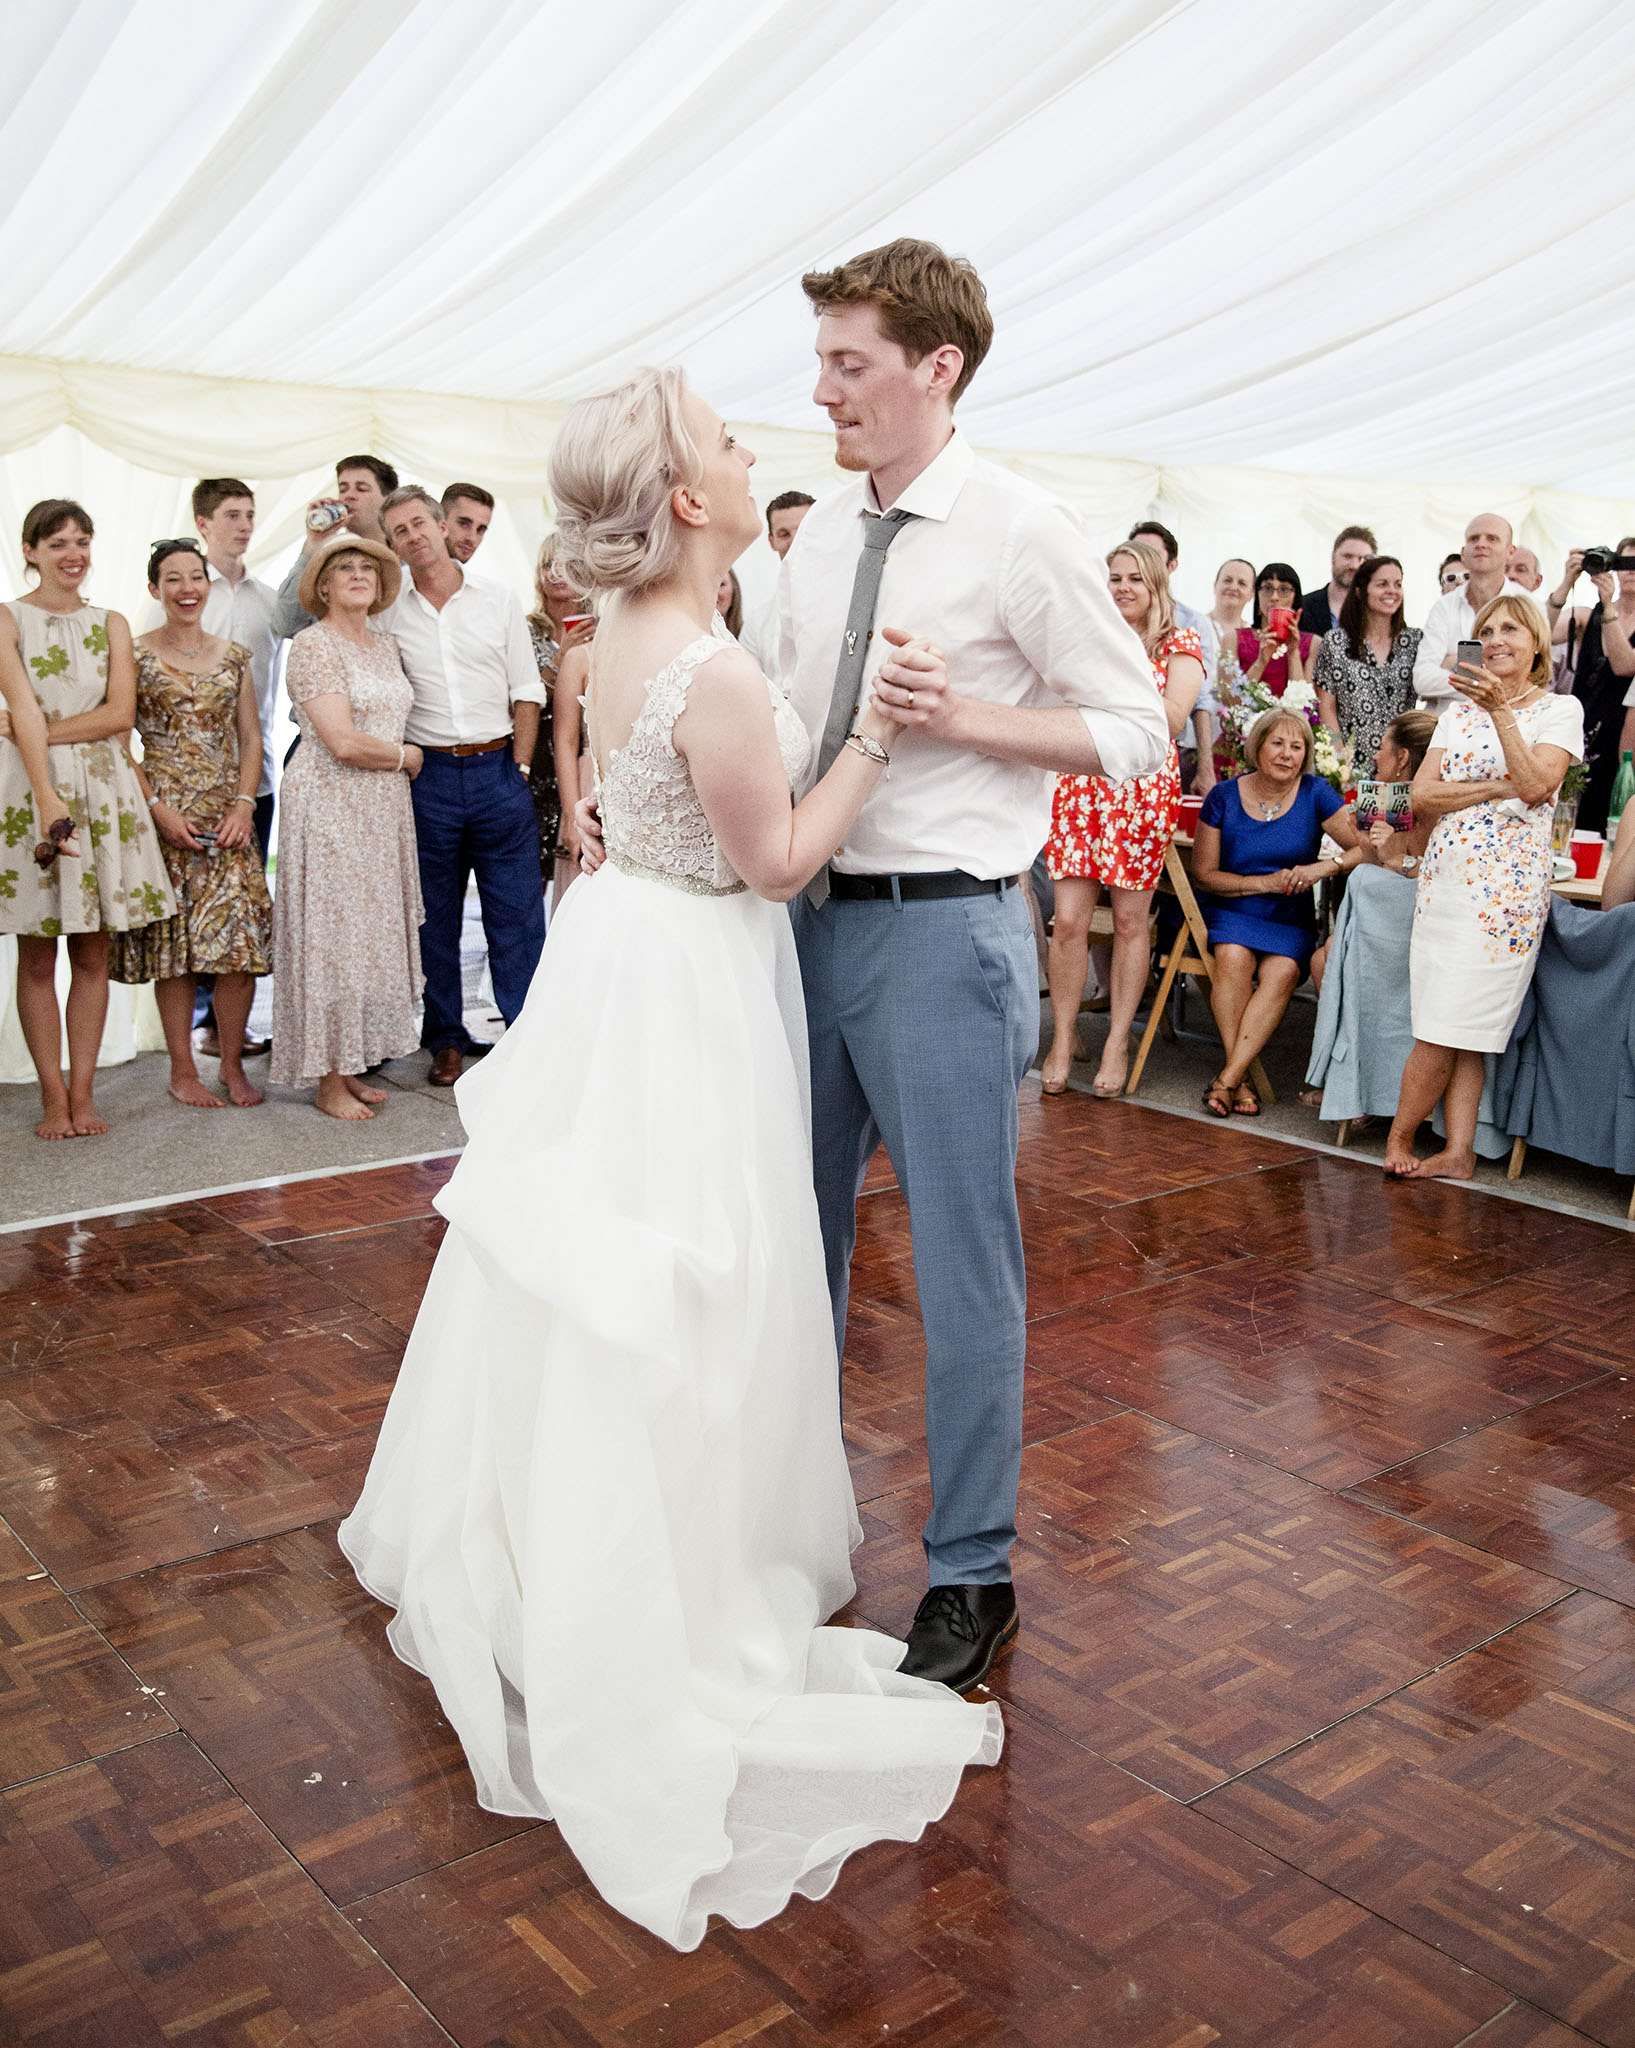 elizabethgphotography_kingslangley_hertfordshire_fineart_wedding_pottersbar_matt_katie_pegg_44.jpg